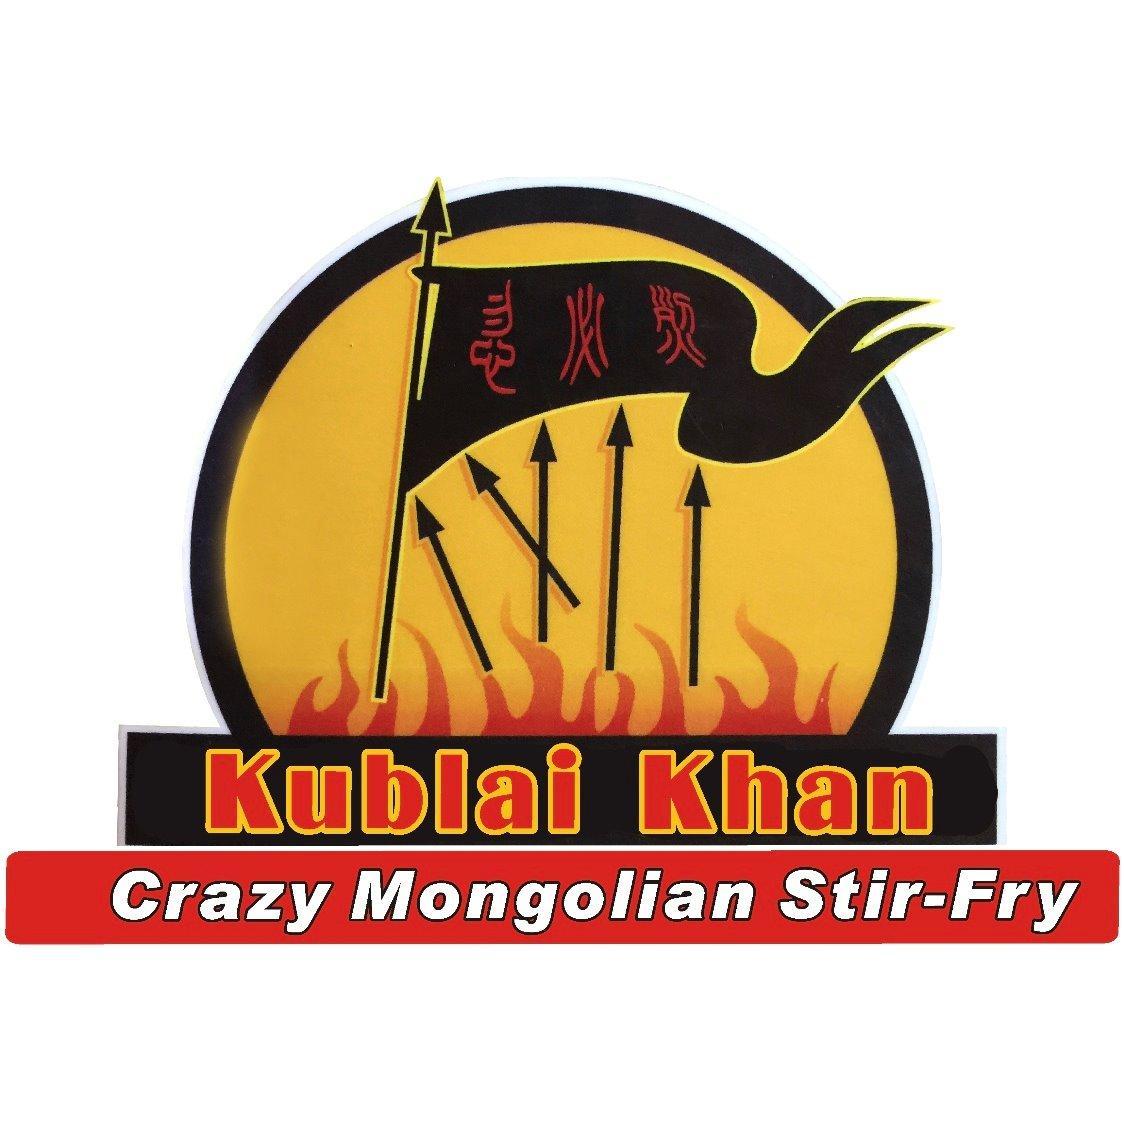 Kublai Khan mongolian grill